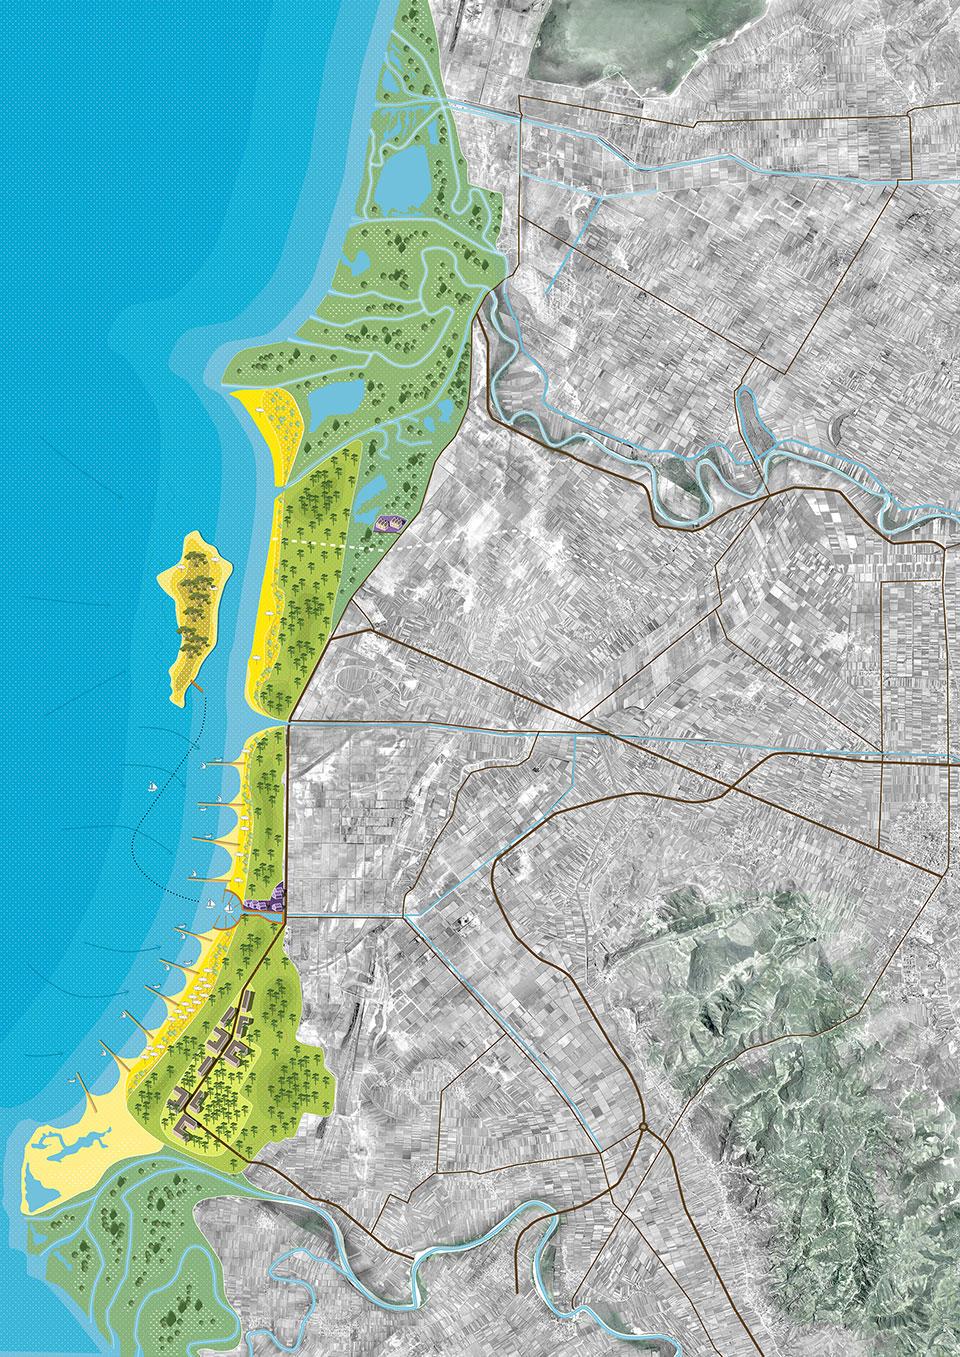 felixx-fier-basemap1.jpg